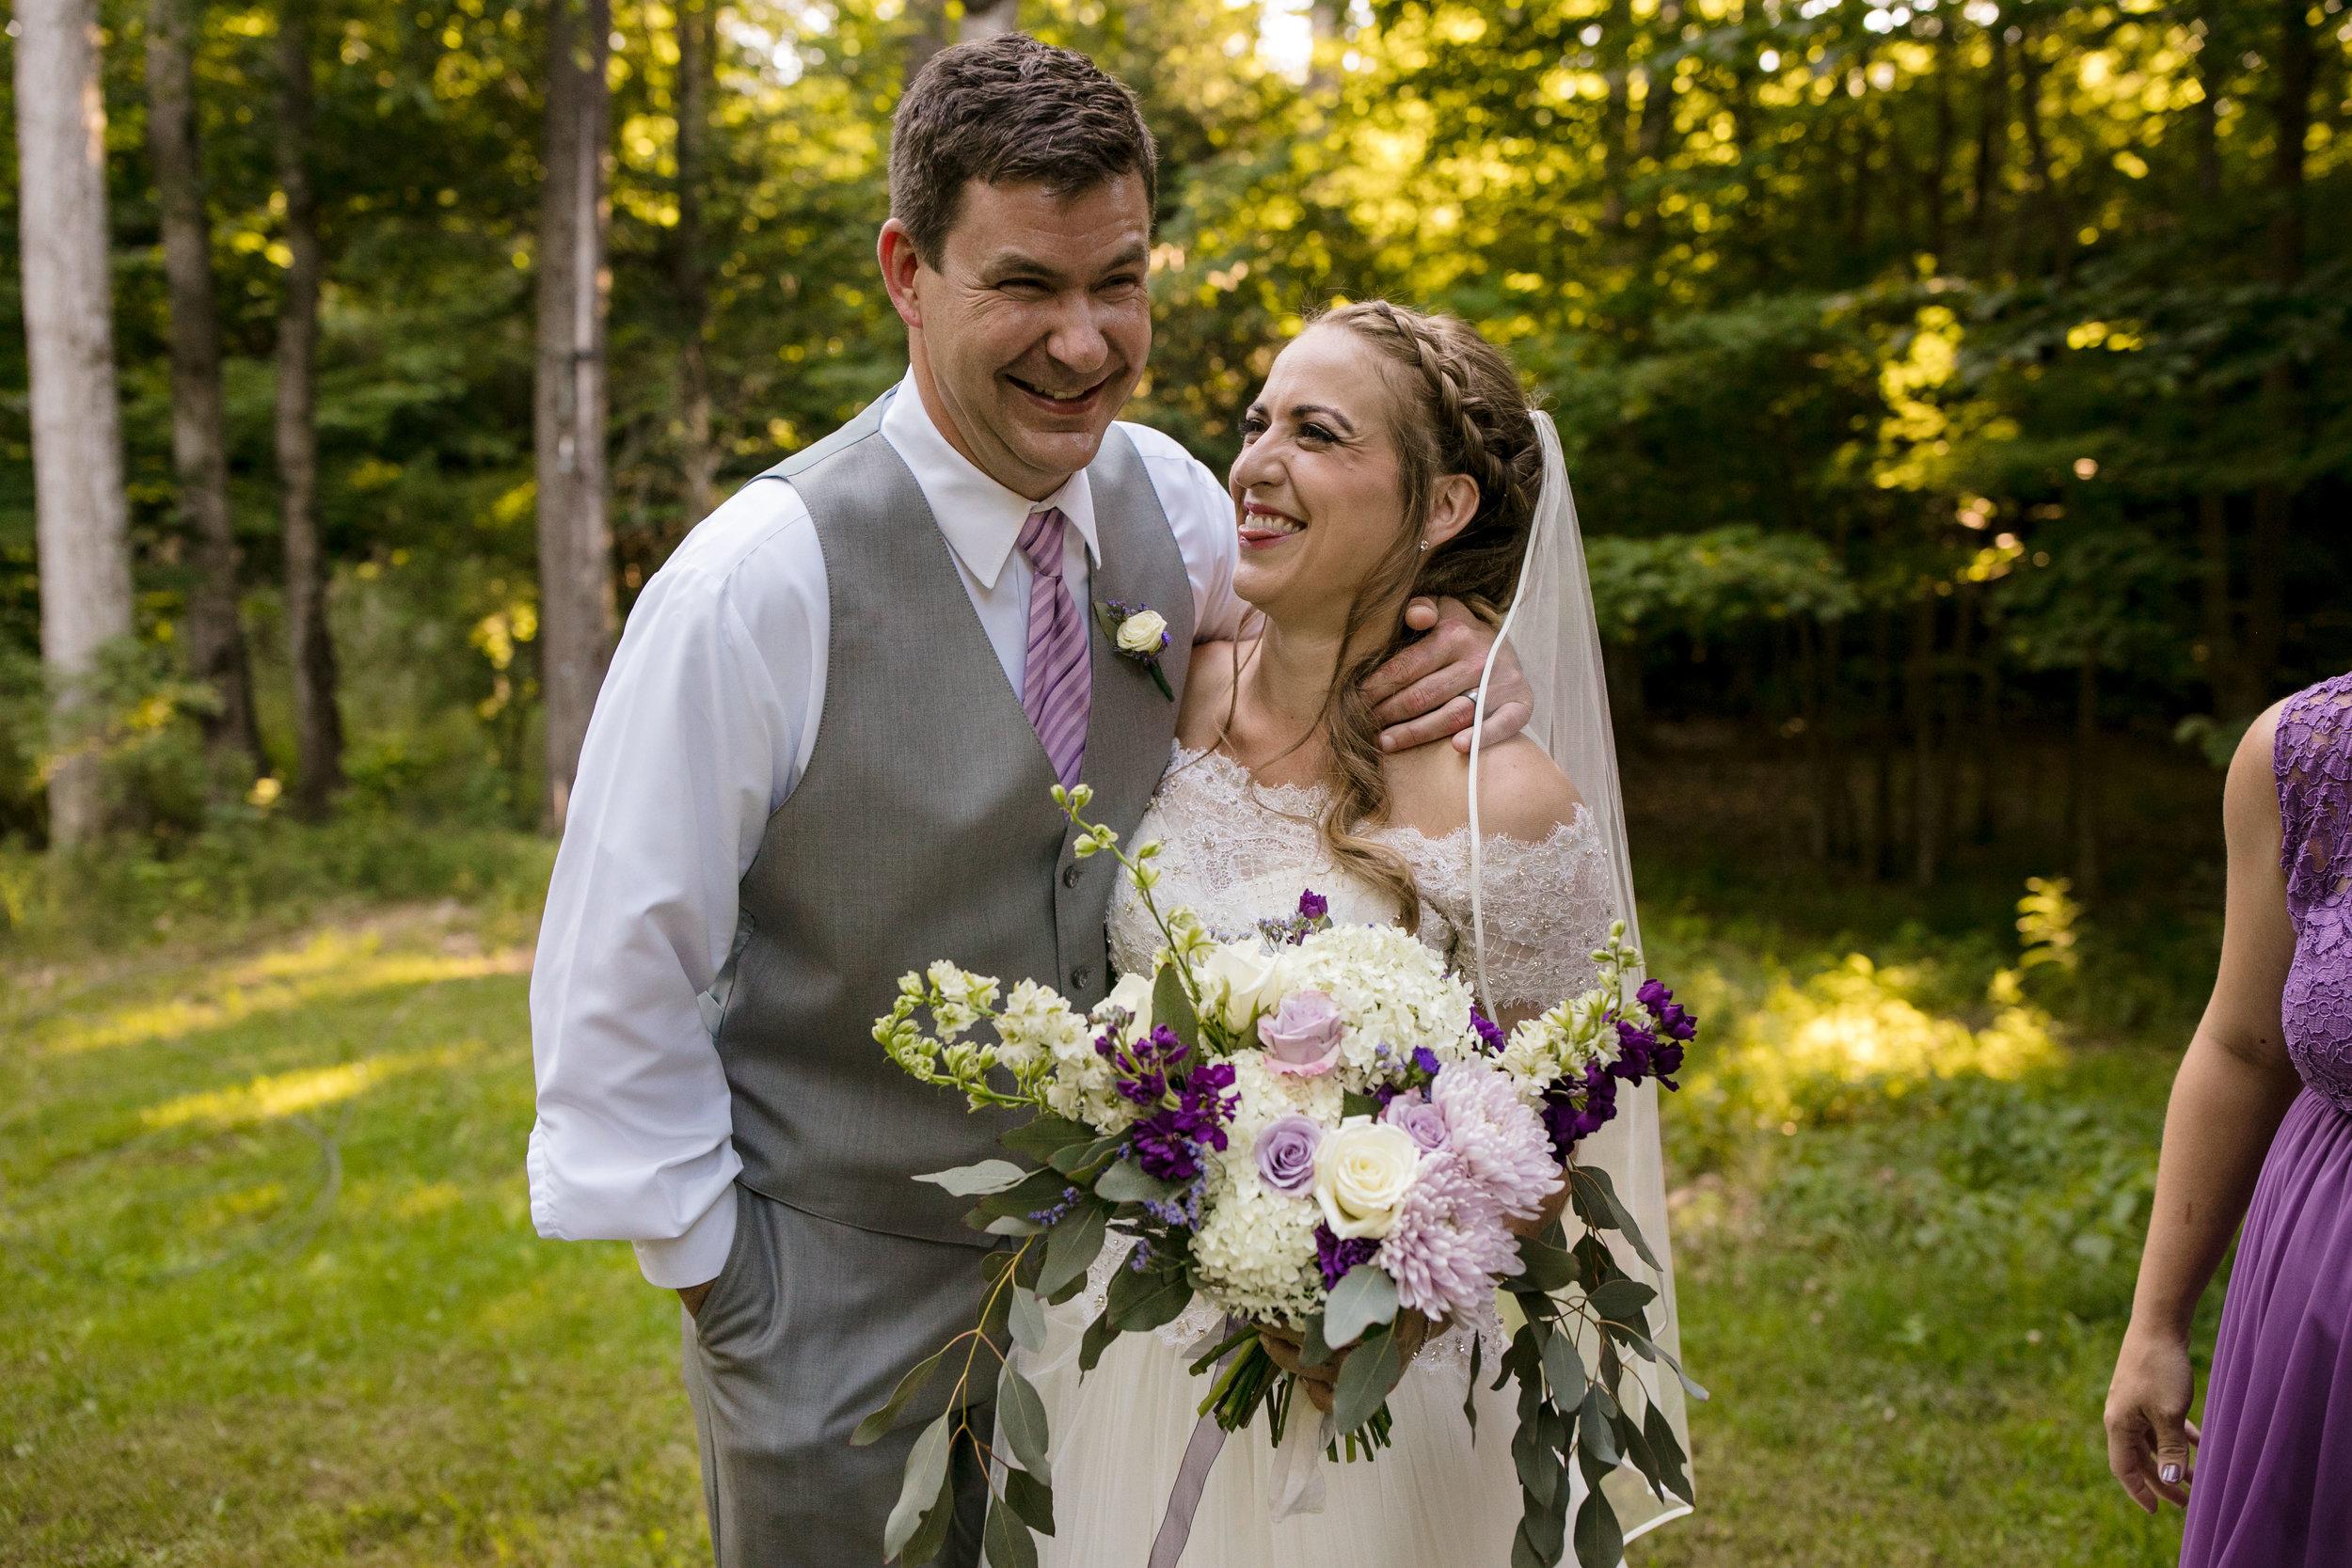 ludington-michigan-intimate-backyard-wedding-jessica-nolan313.jpg